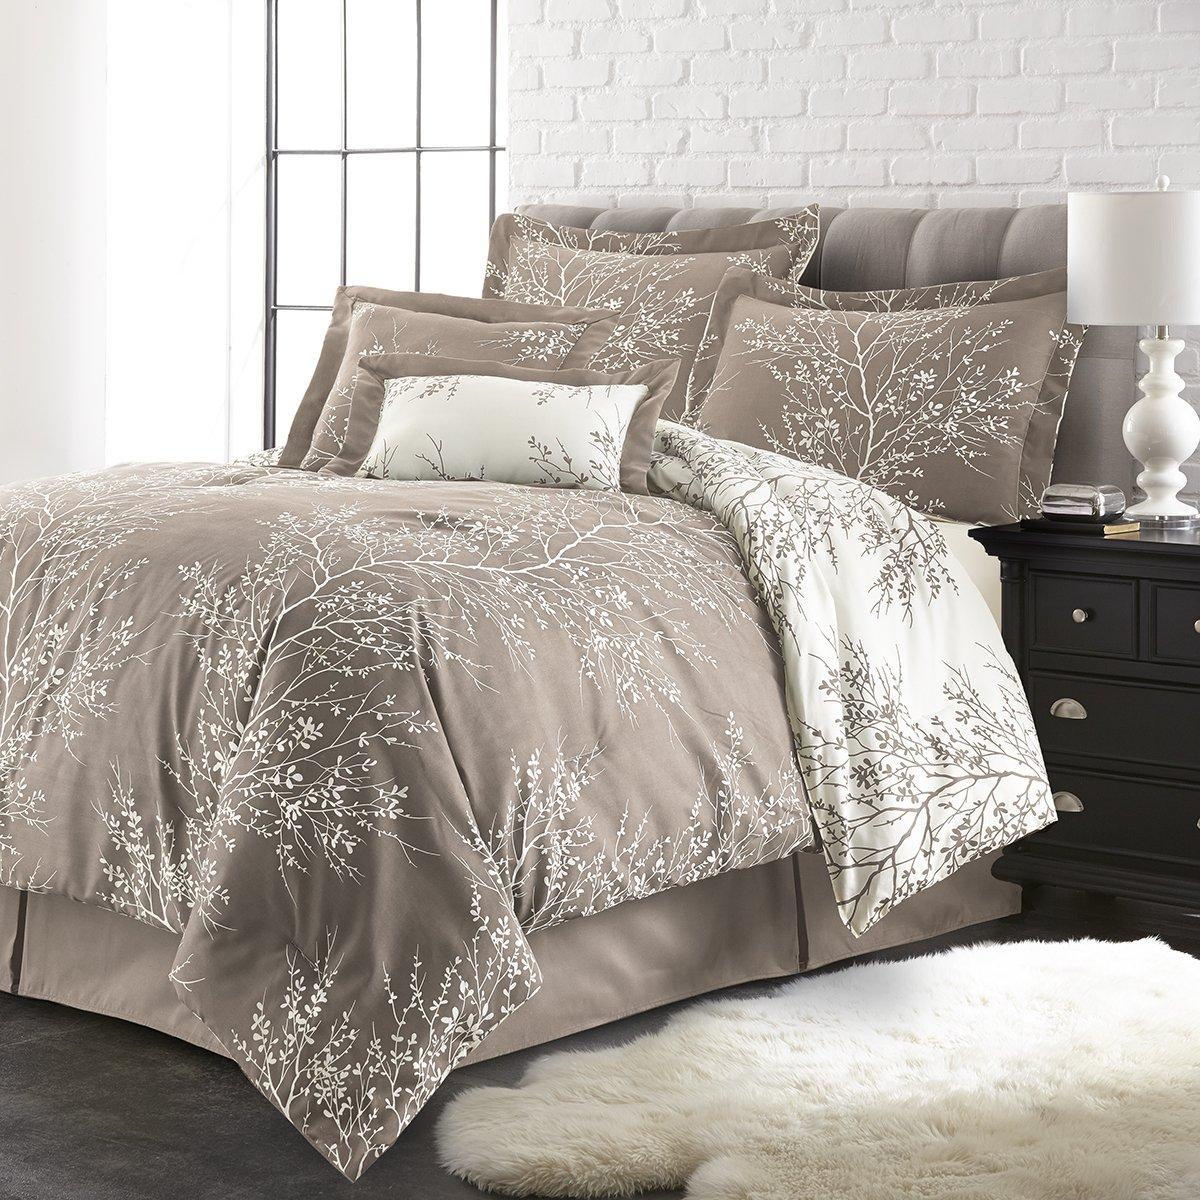 Spirit Linen Hotel 5Th Ave Plush Reversible Foliage Comforter Set, Queen, Taupe/White